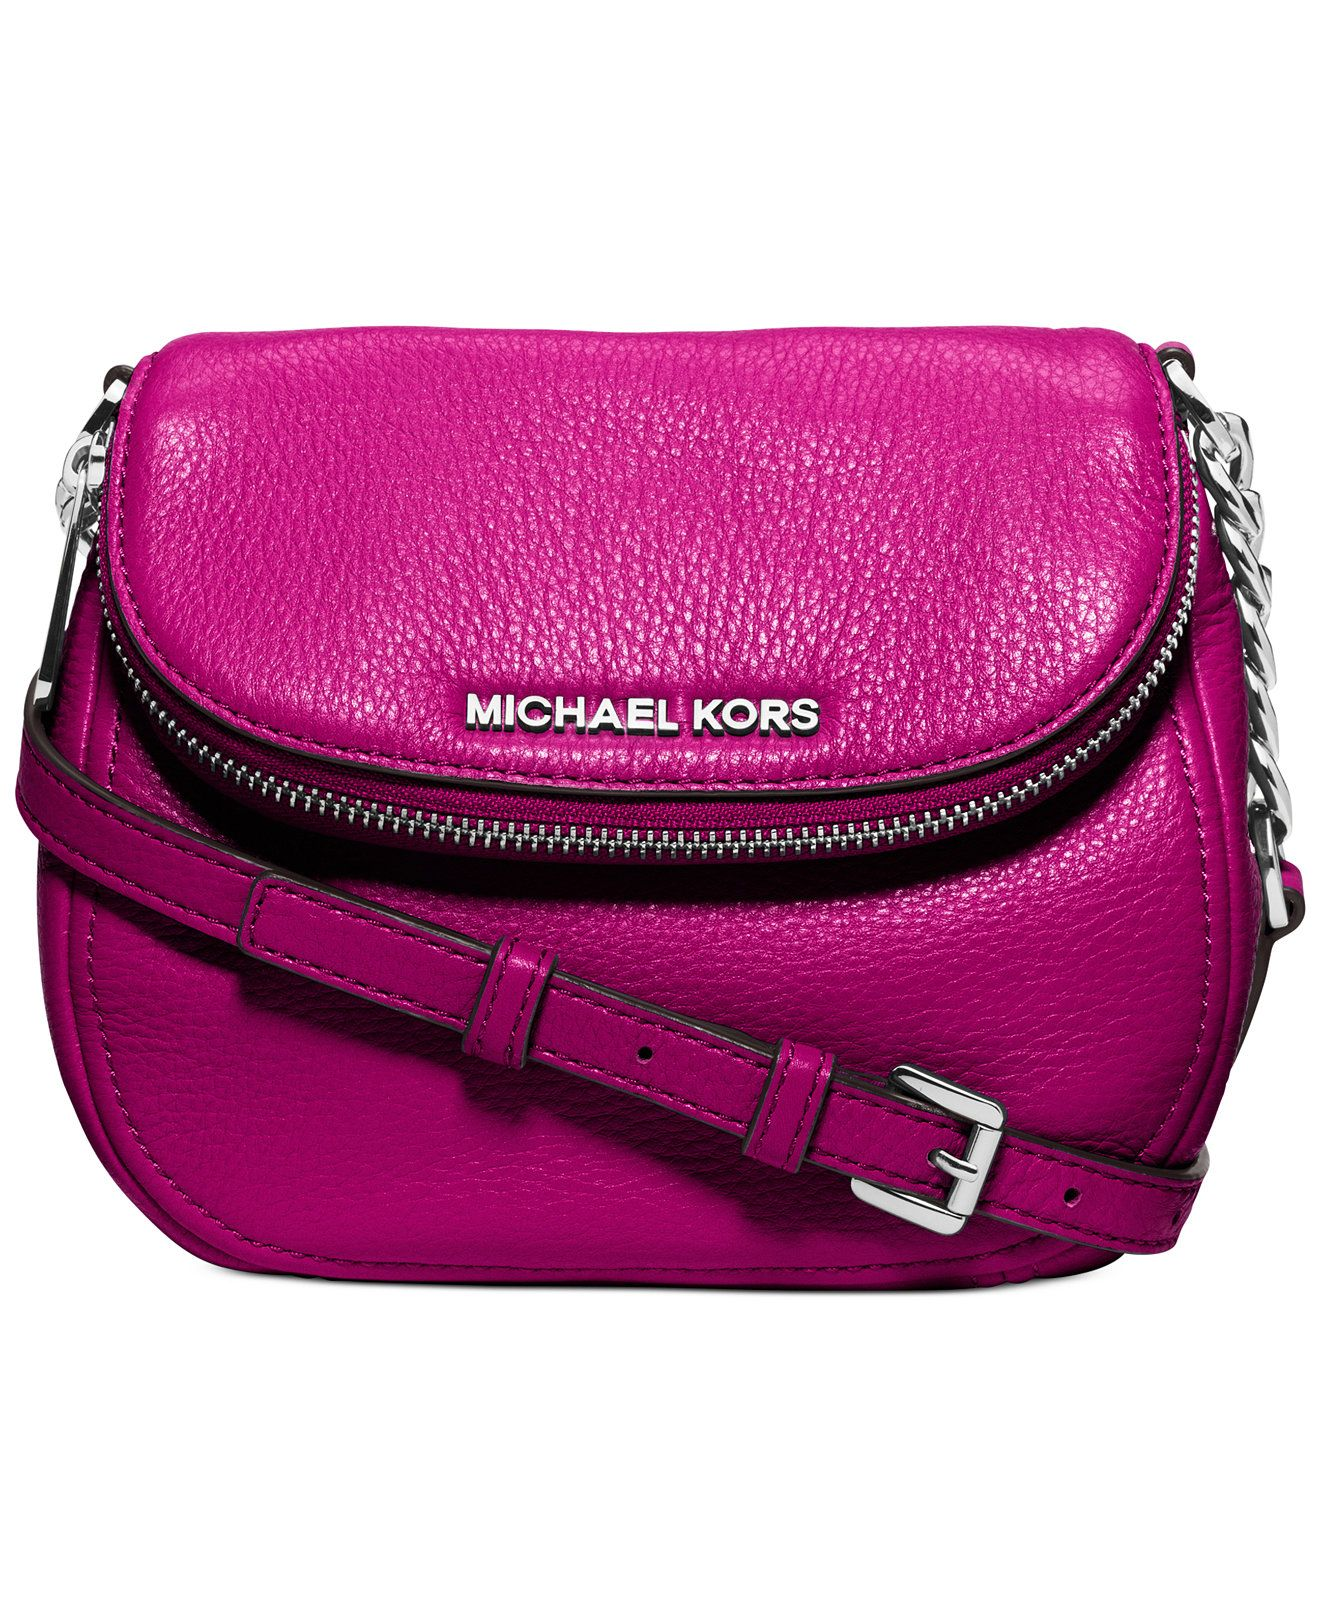 MICHAEL Michael Kors Bedford Flap Crossbody - Handbags \u0026 Accessories -  Macy\u0027s